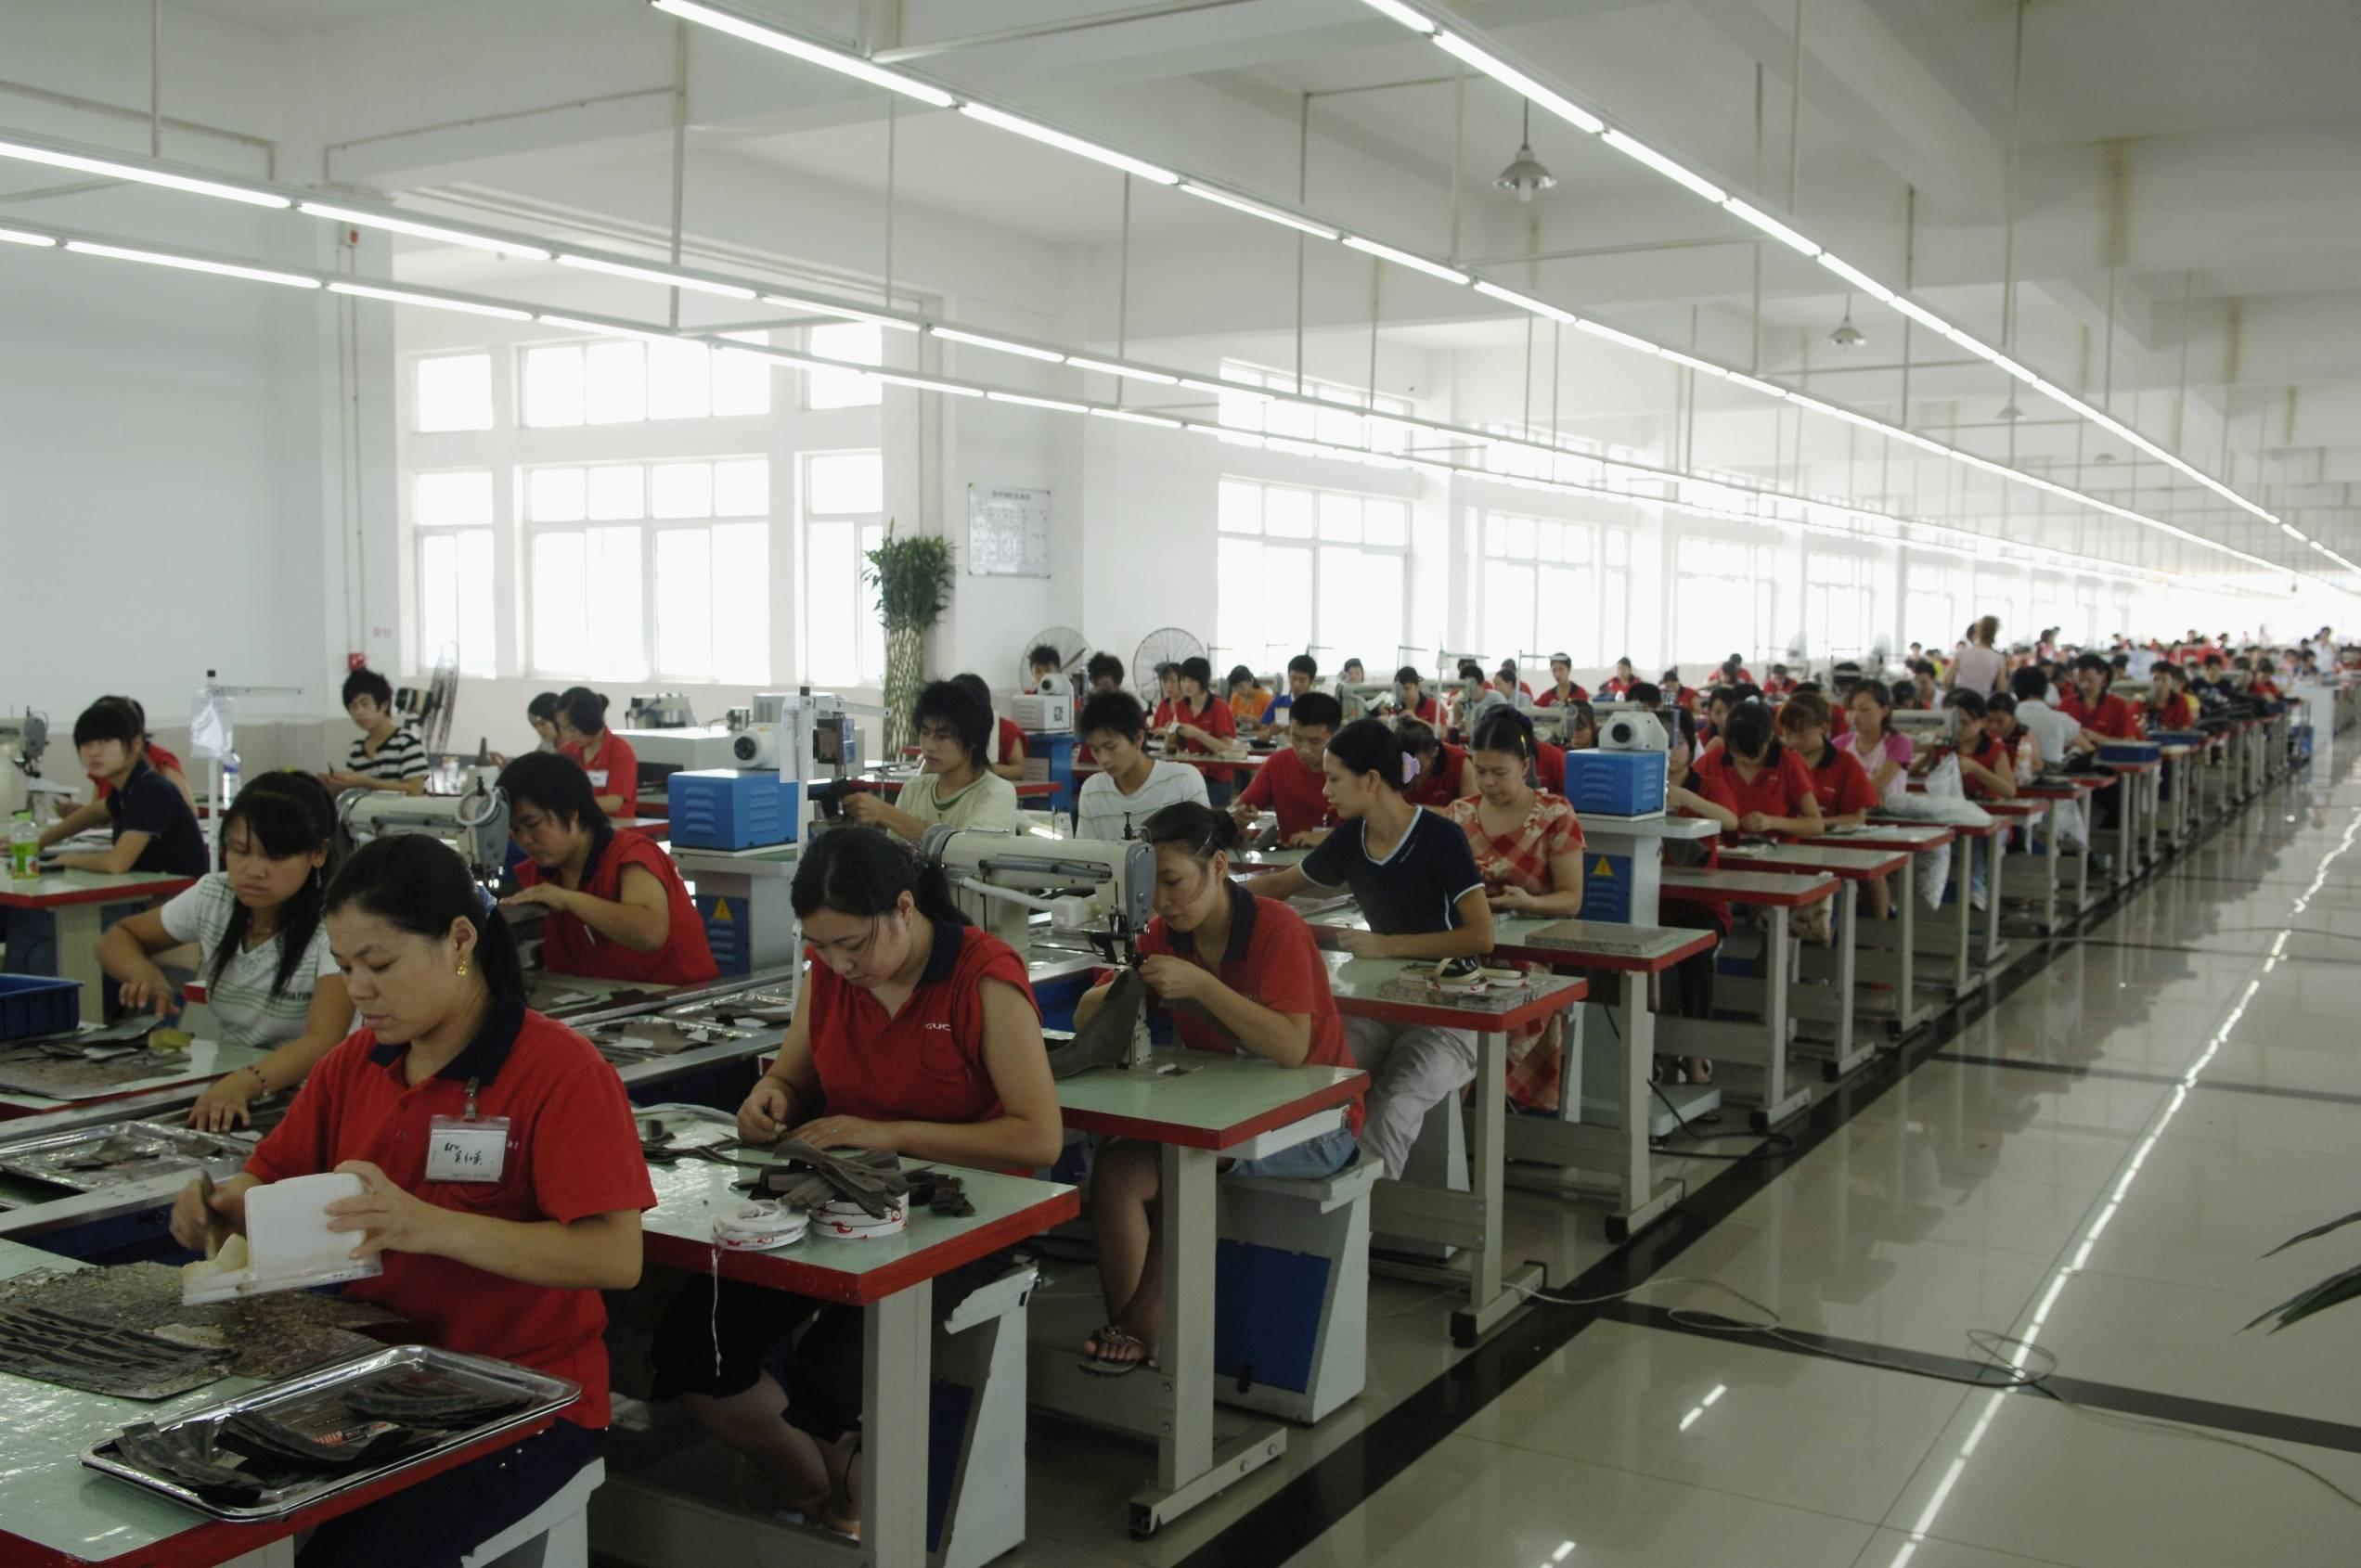 Rollespill: Tekstilfabrikken